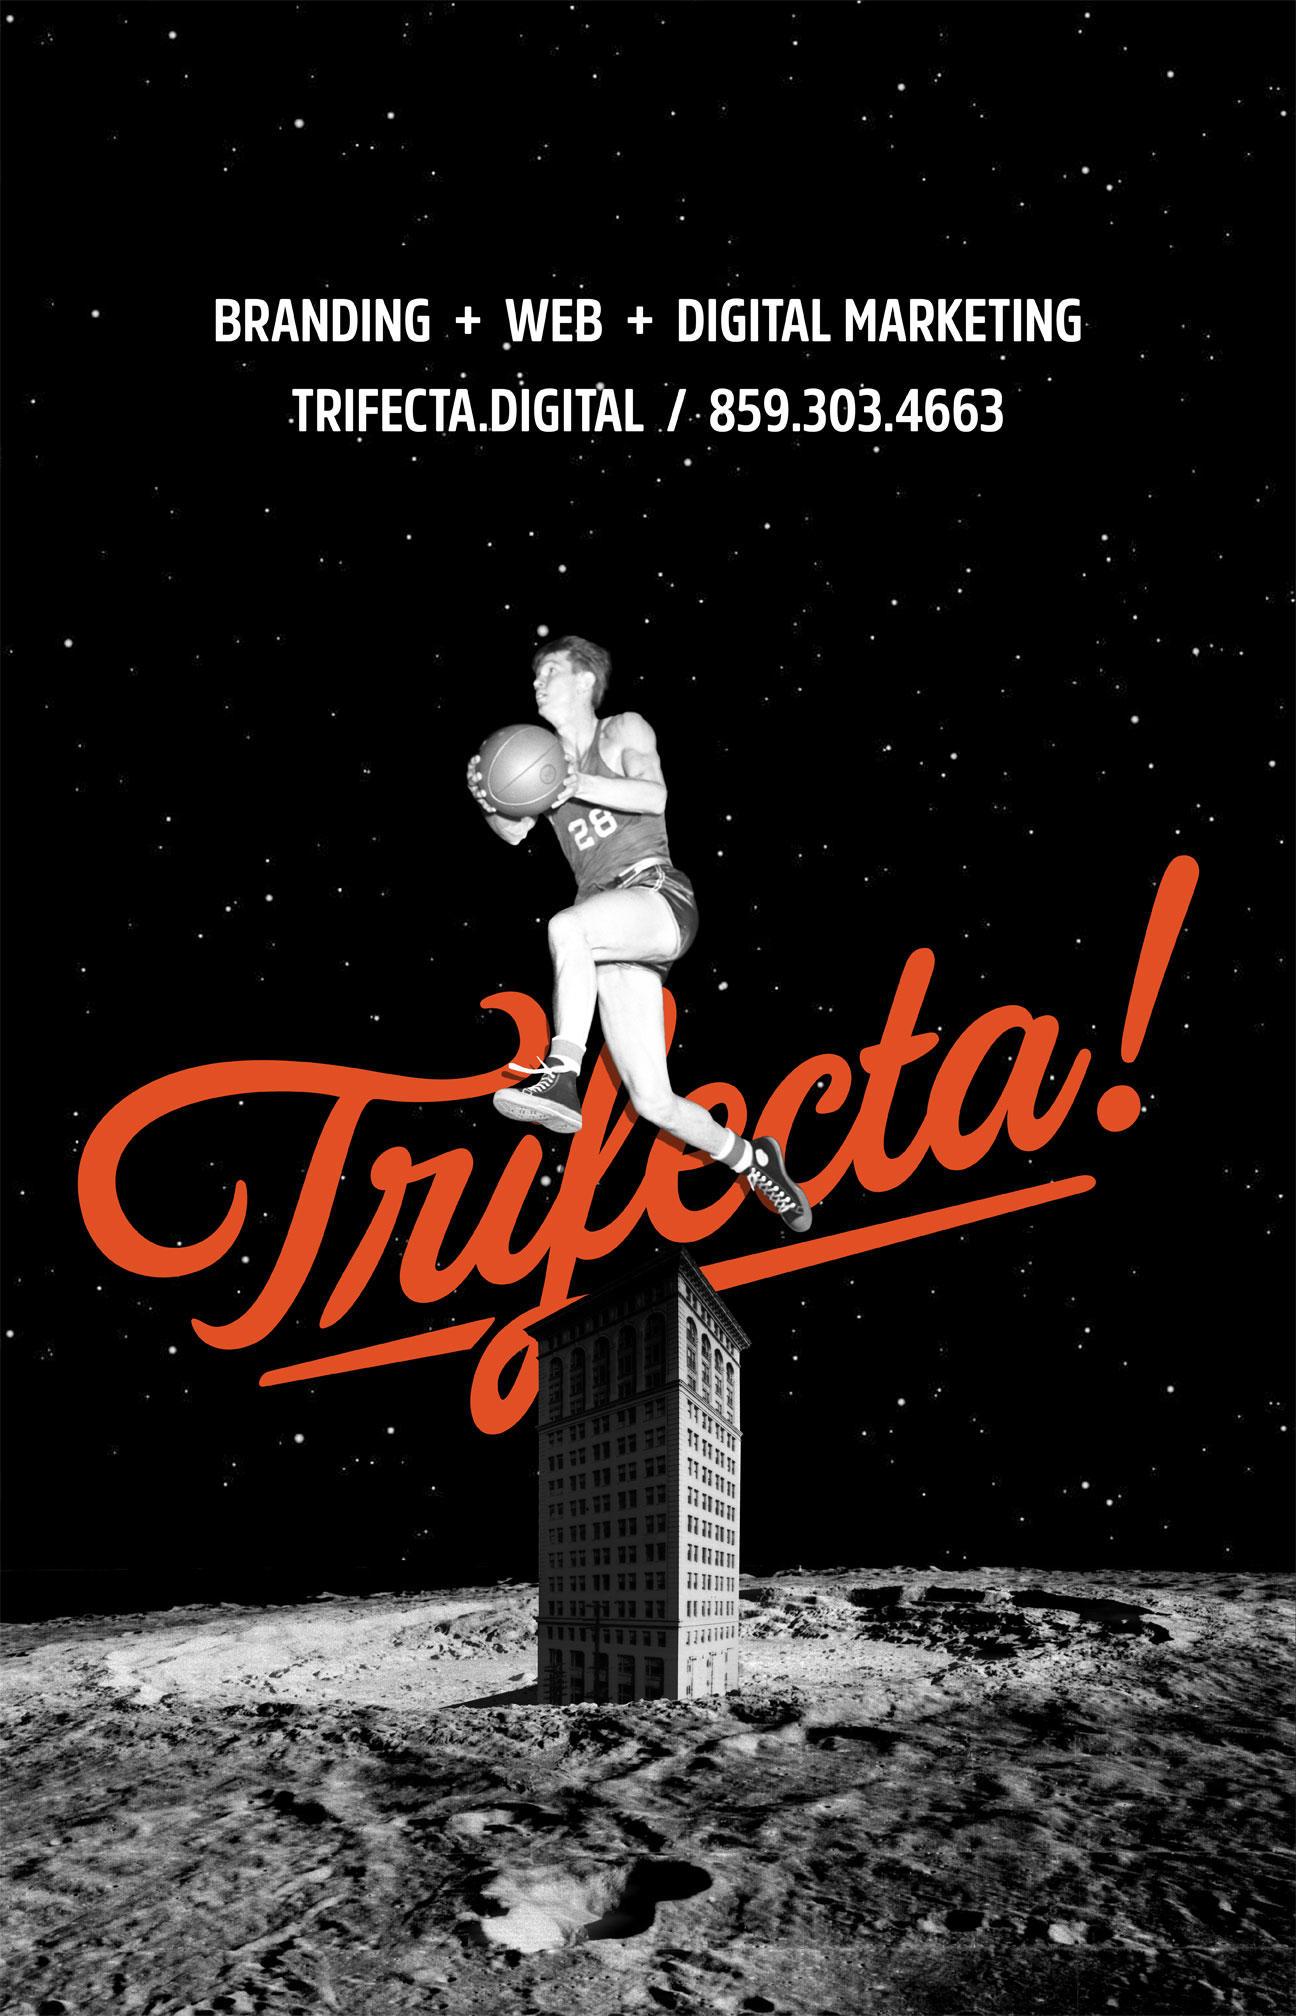 Trifecta image 2